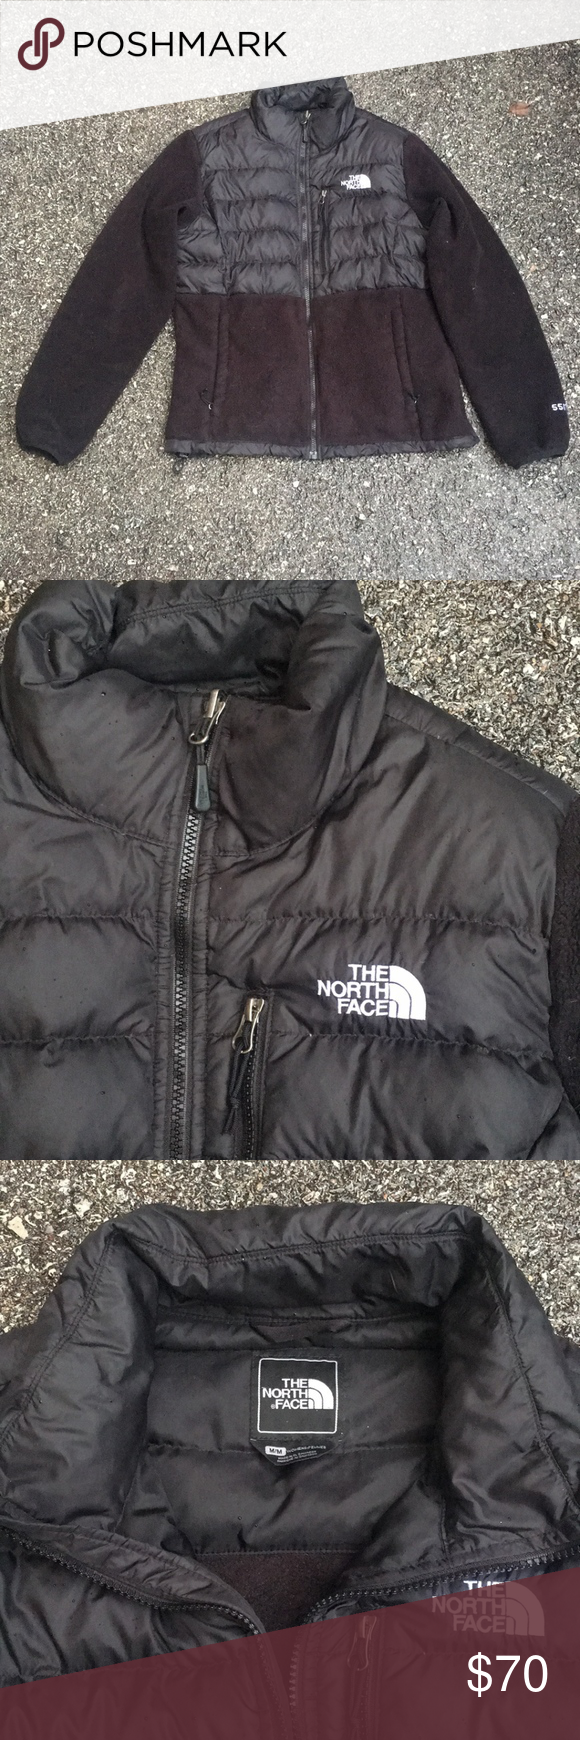 The North Face Black Denali Jacket Black North Face Jackets The North Face [ 1740 x 580 Pixel ]